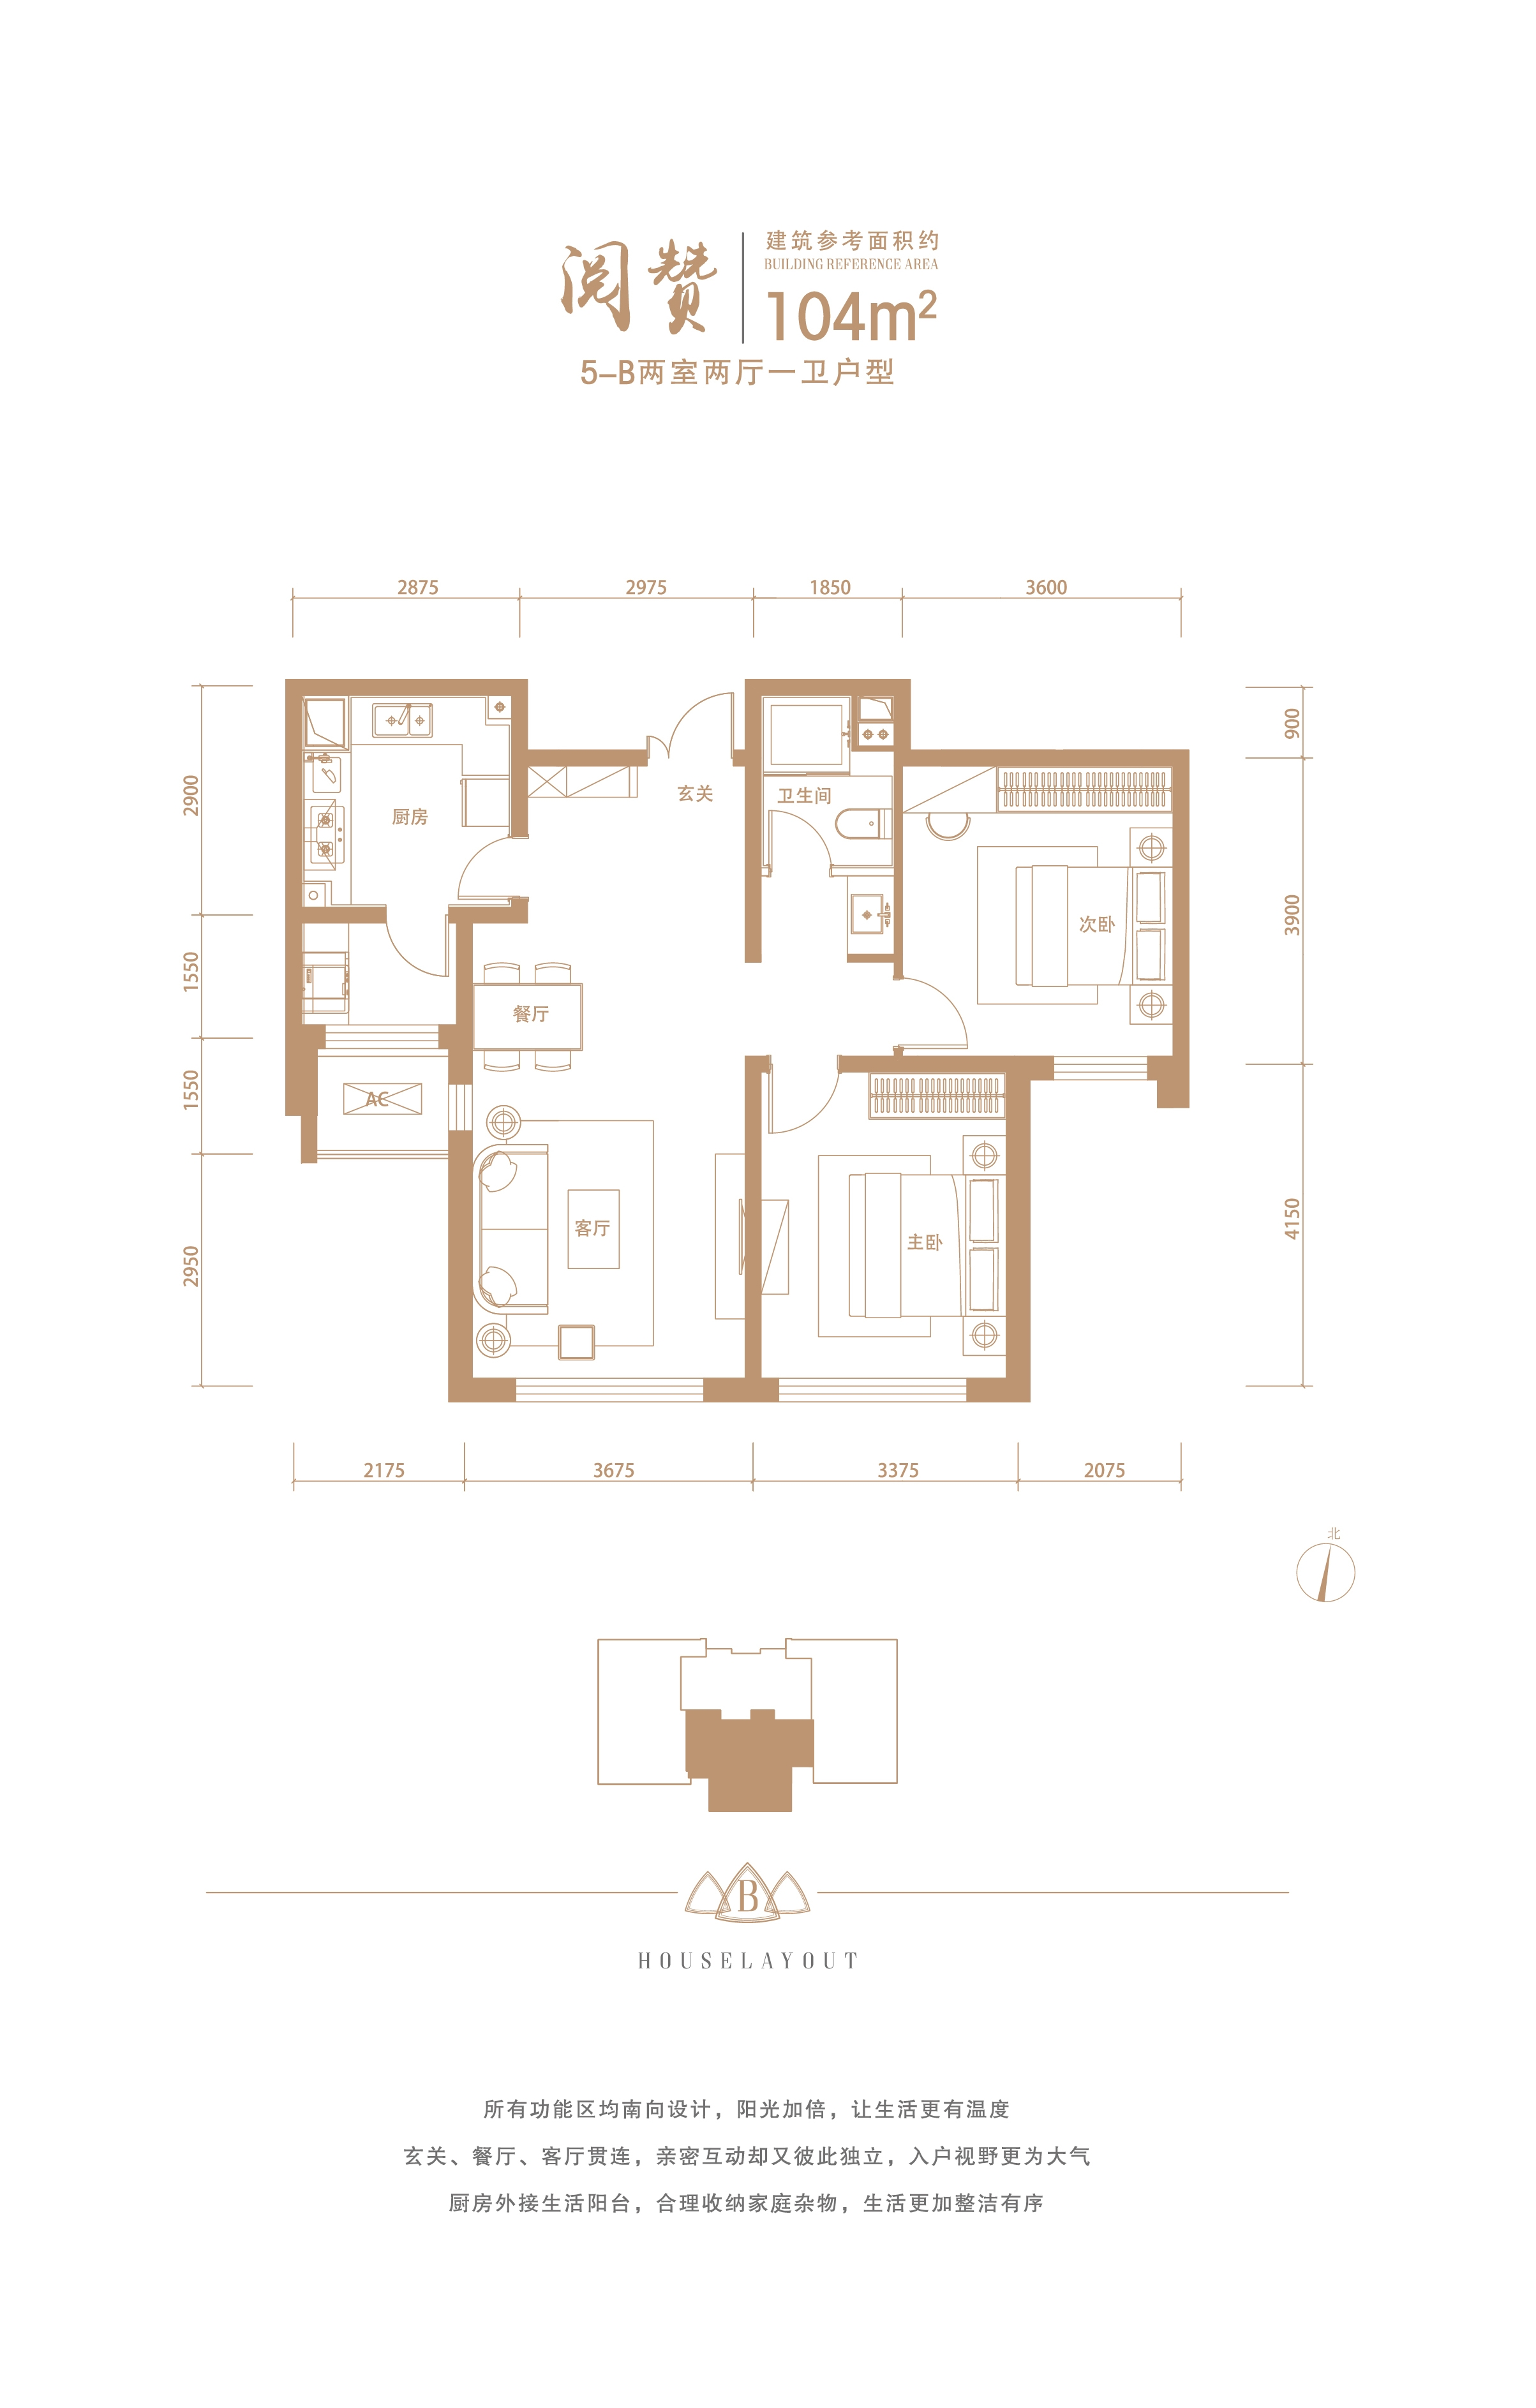 5-B户型104平米 两室两厅一卫